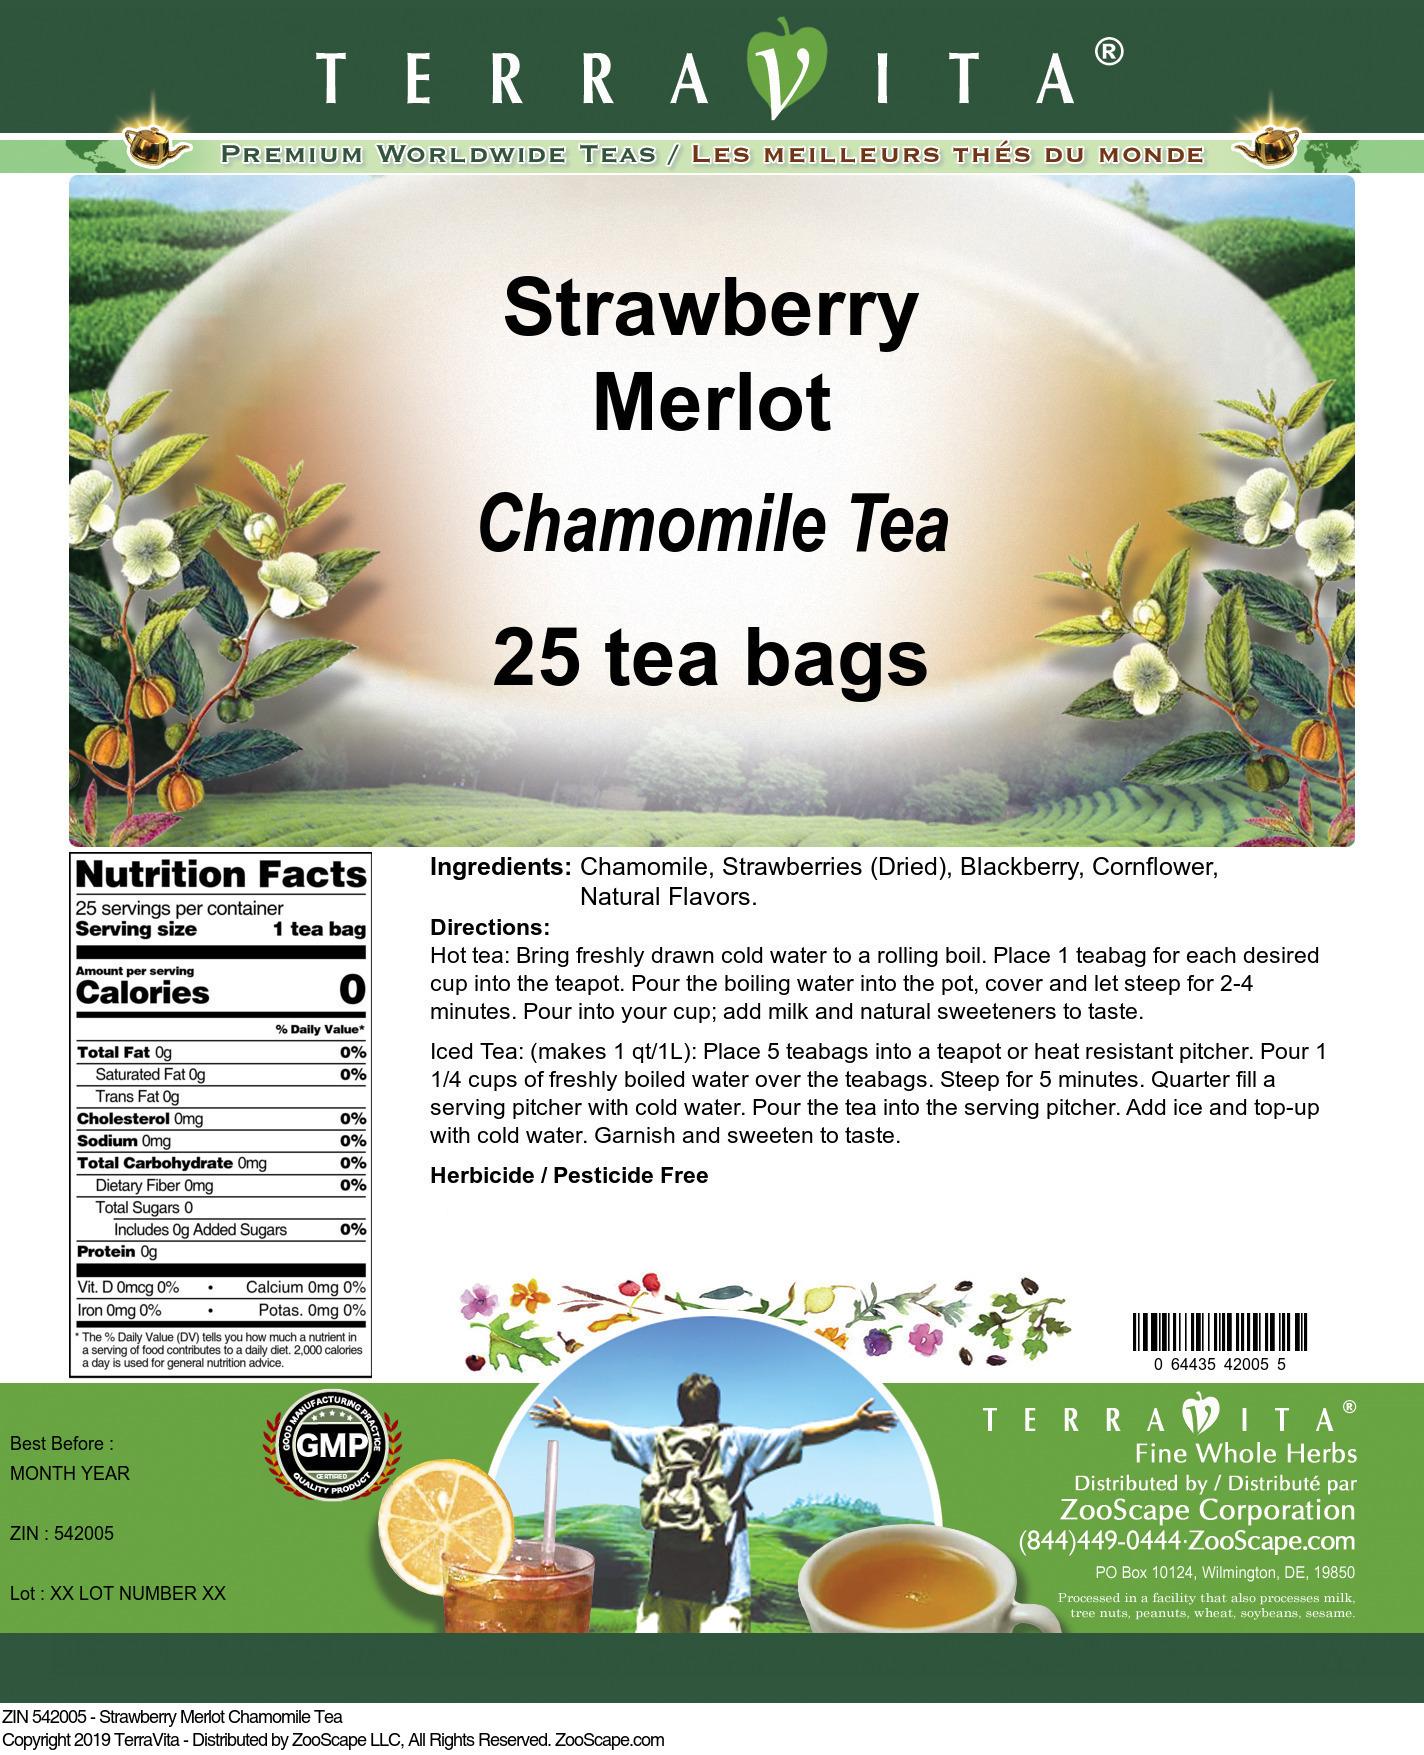 Strawberry Merlot Chamomile Tea